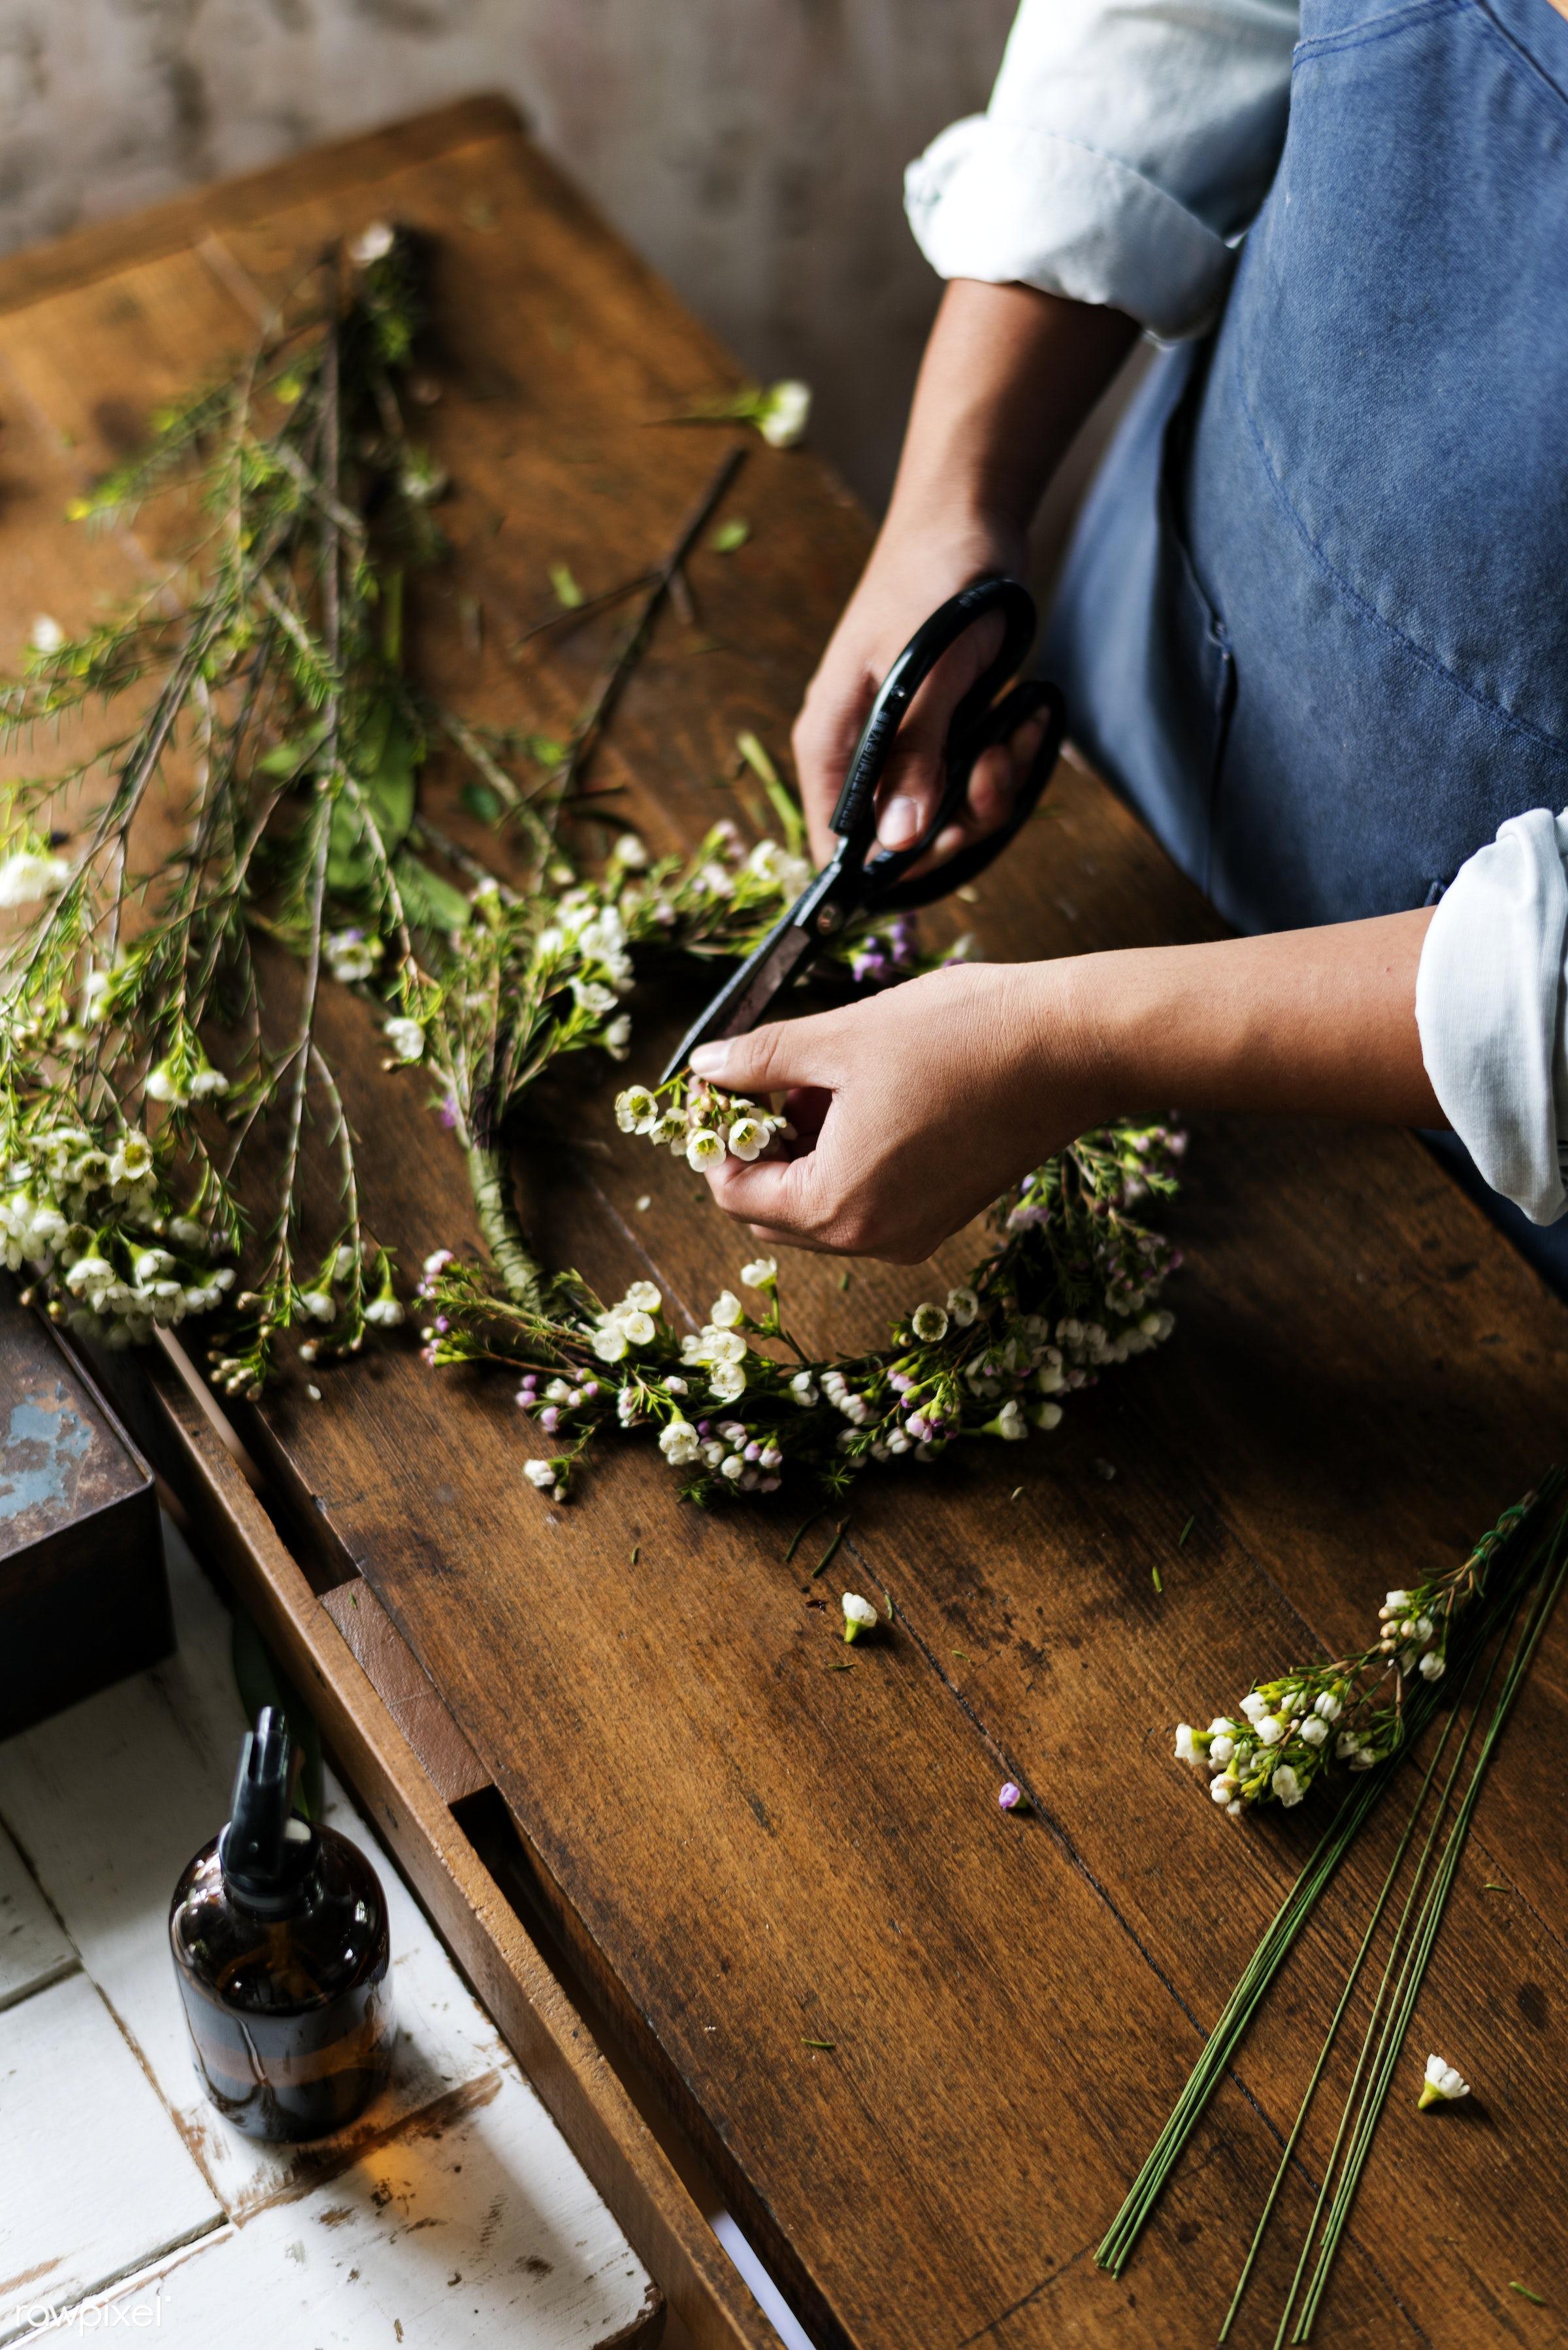 shop, detail, person, merchandise, people, decor, nature, flowers, work, hold, refreshment, career, florist, present,...